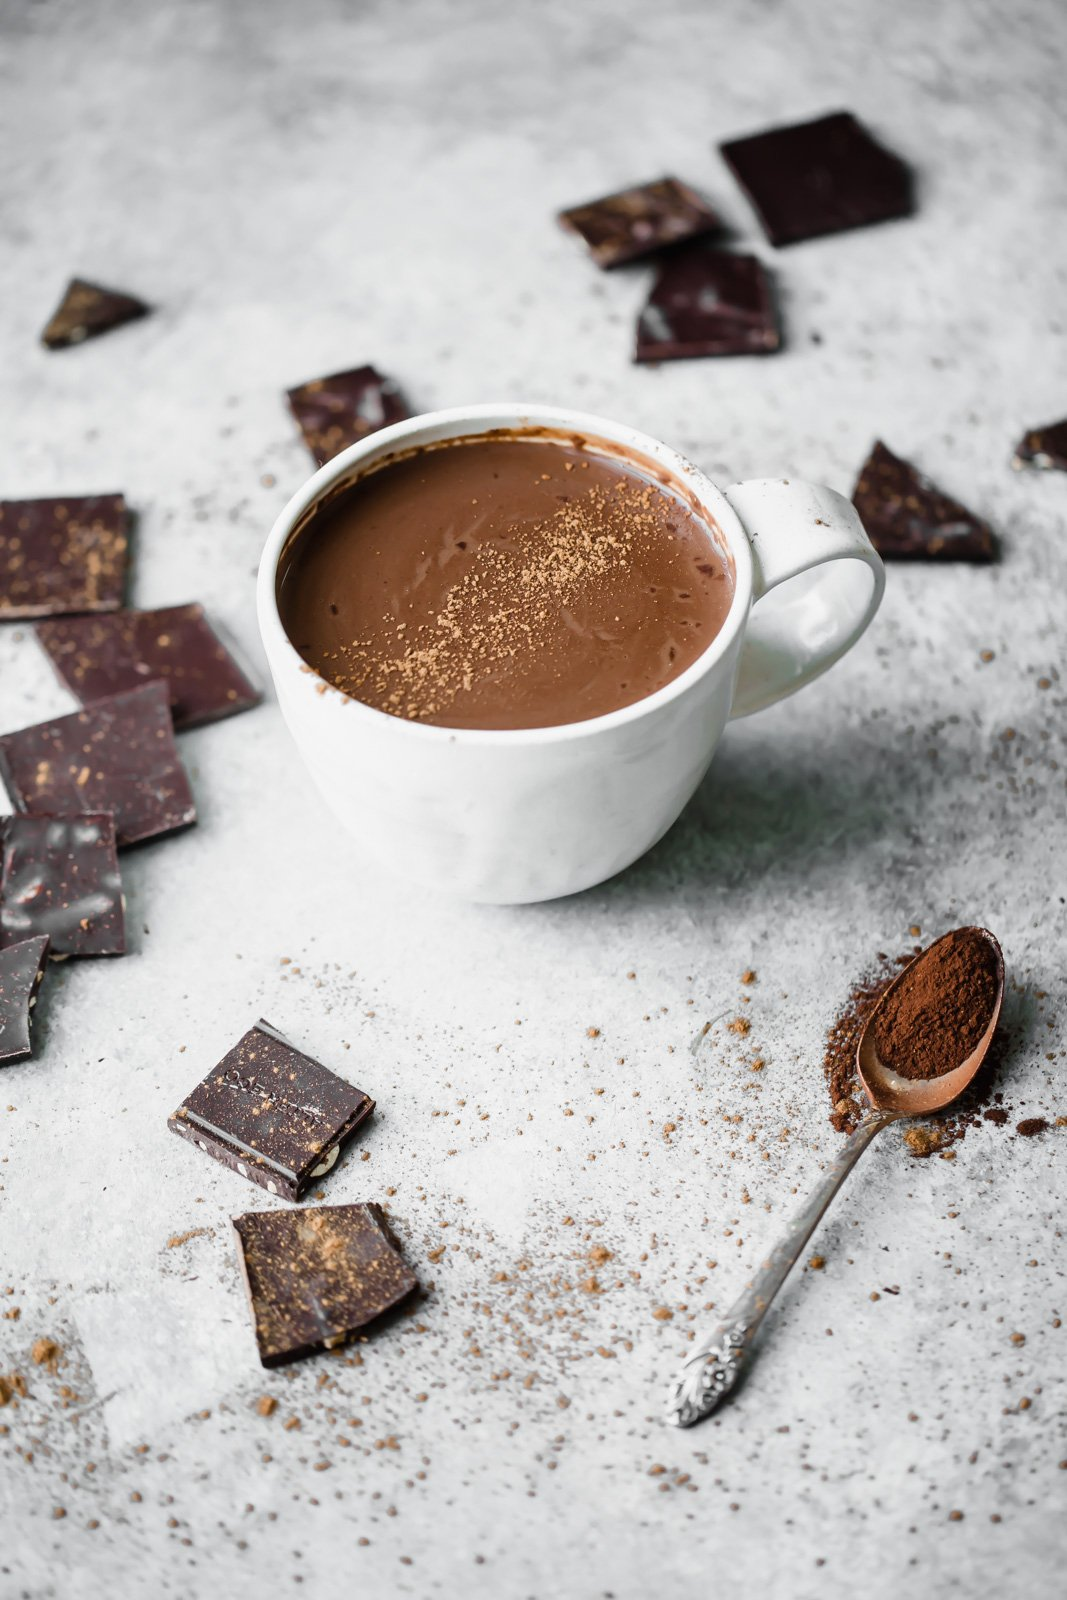 vegan hot chocolate in a mug next to squares of dark chocolate